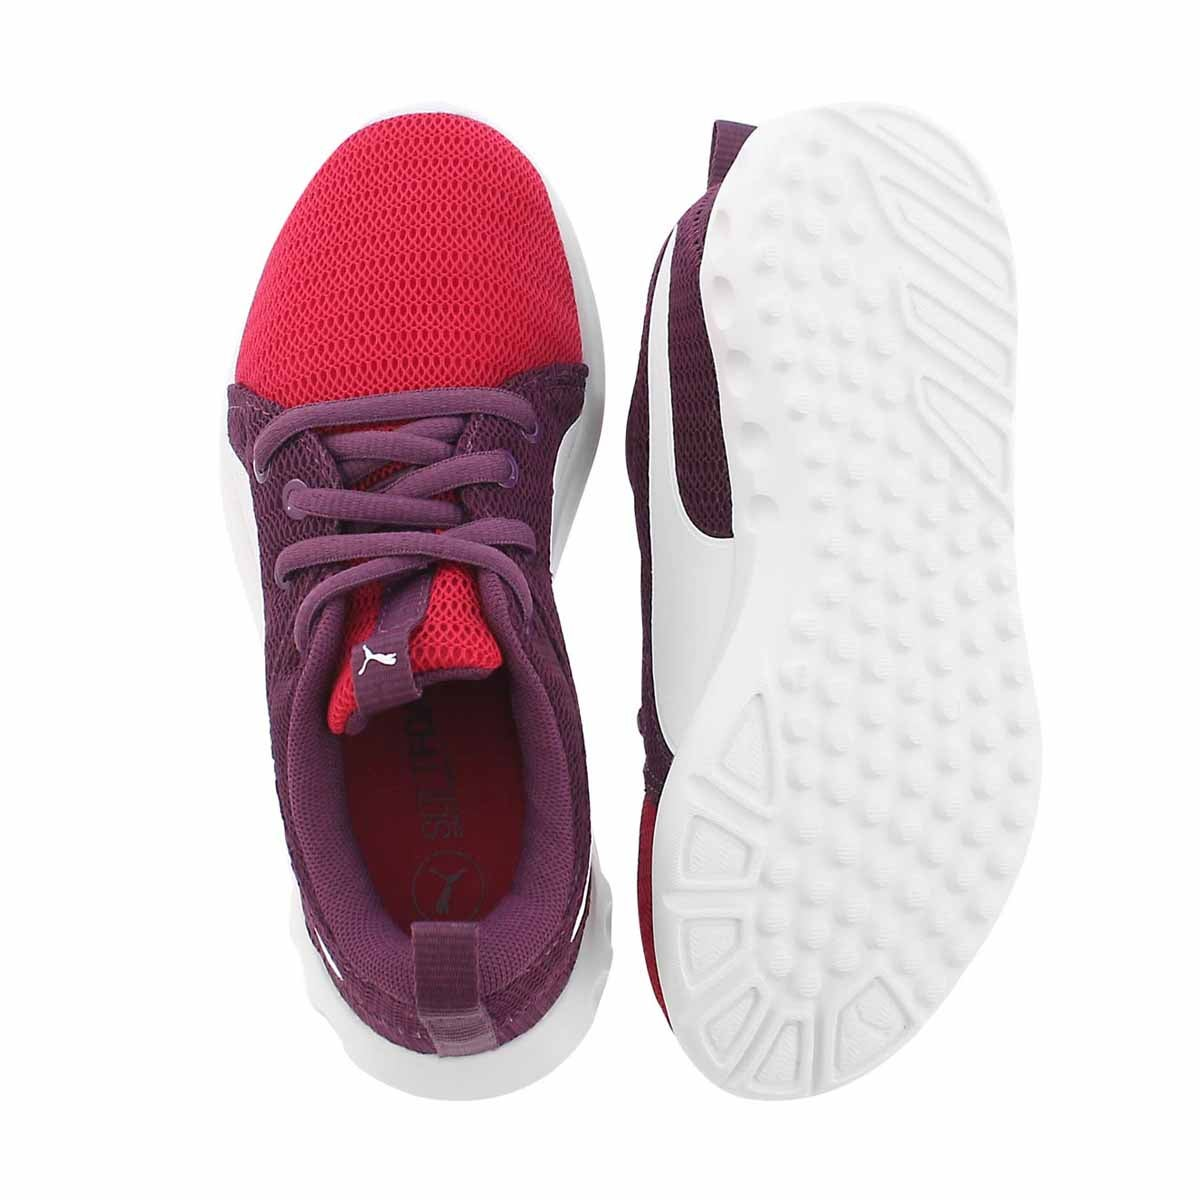 Grls Carson 2 Jr pink lace up sneaker